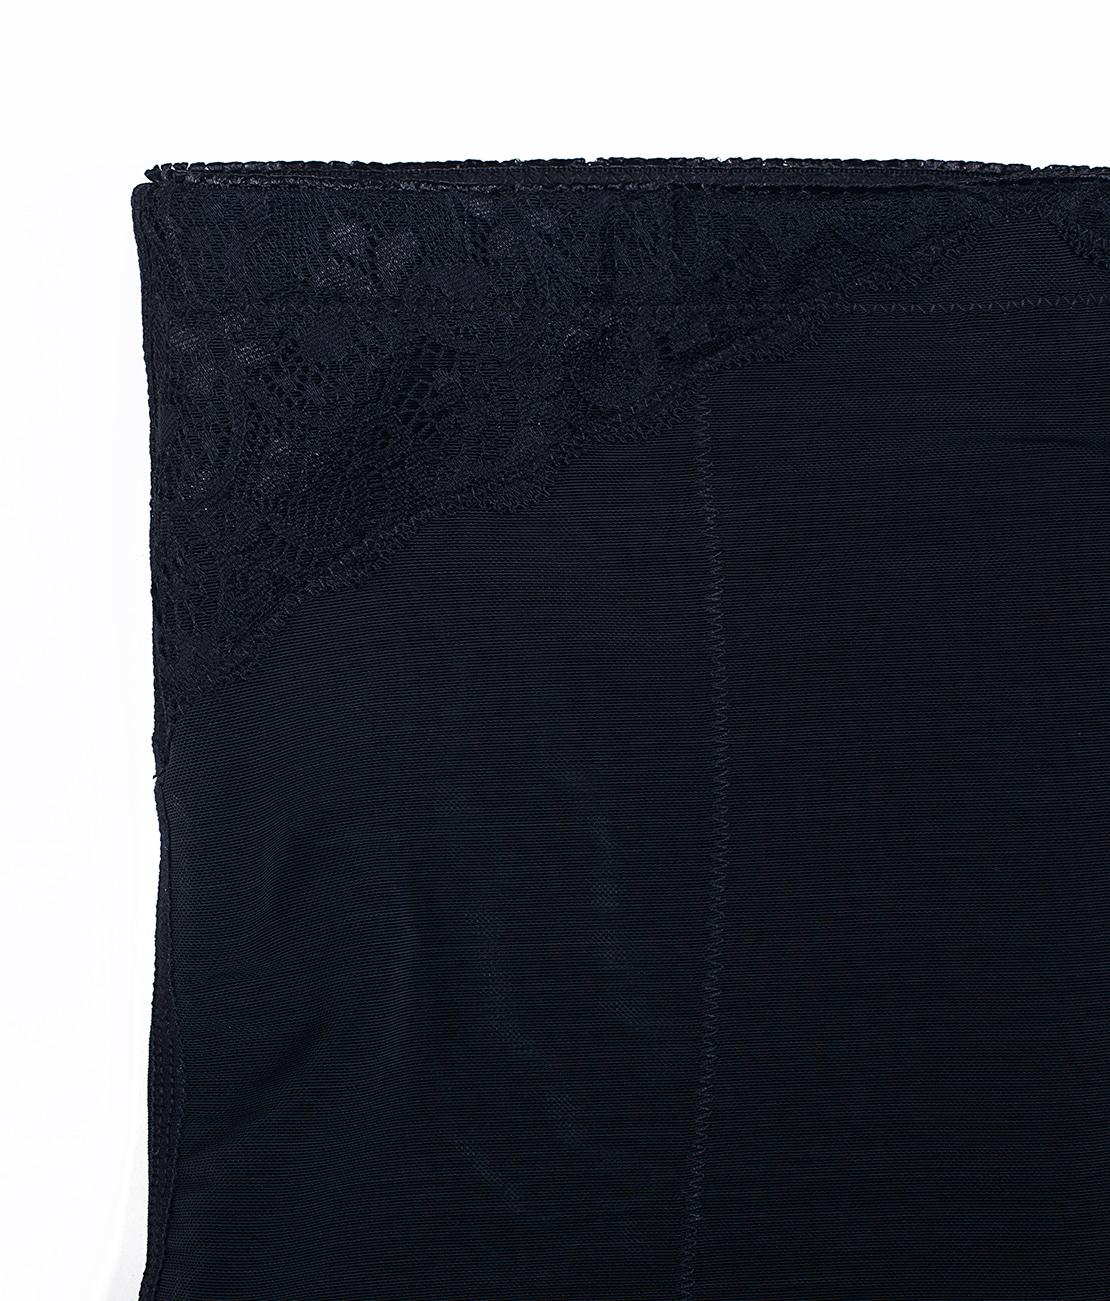 Shorty Gainant Invisible Noir Packshot Detail 2